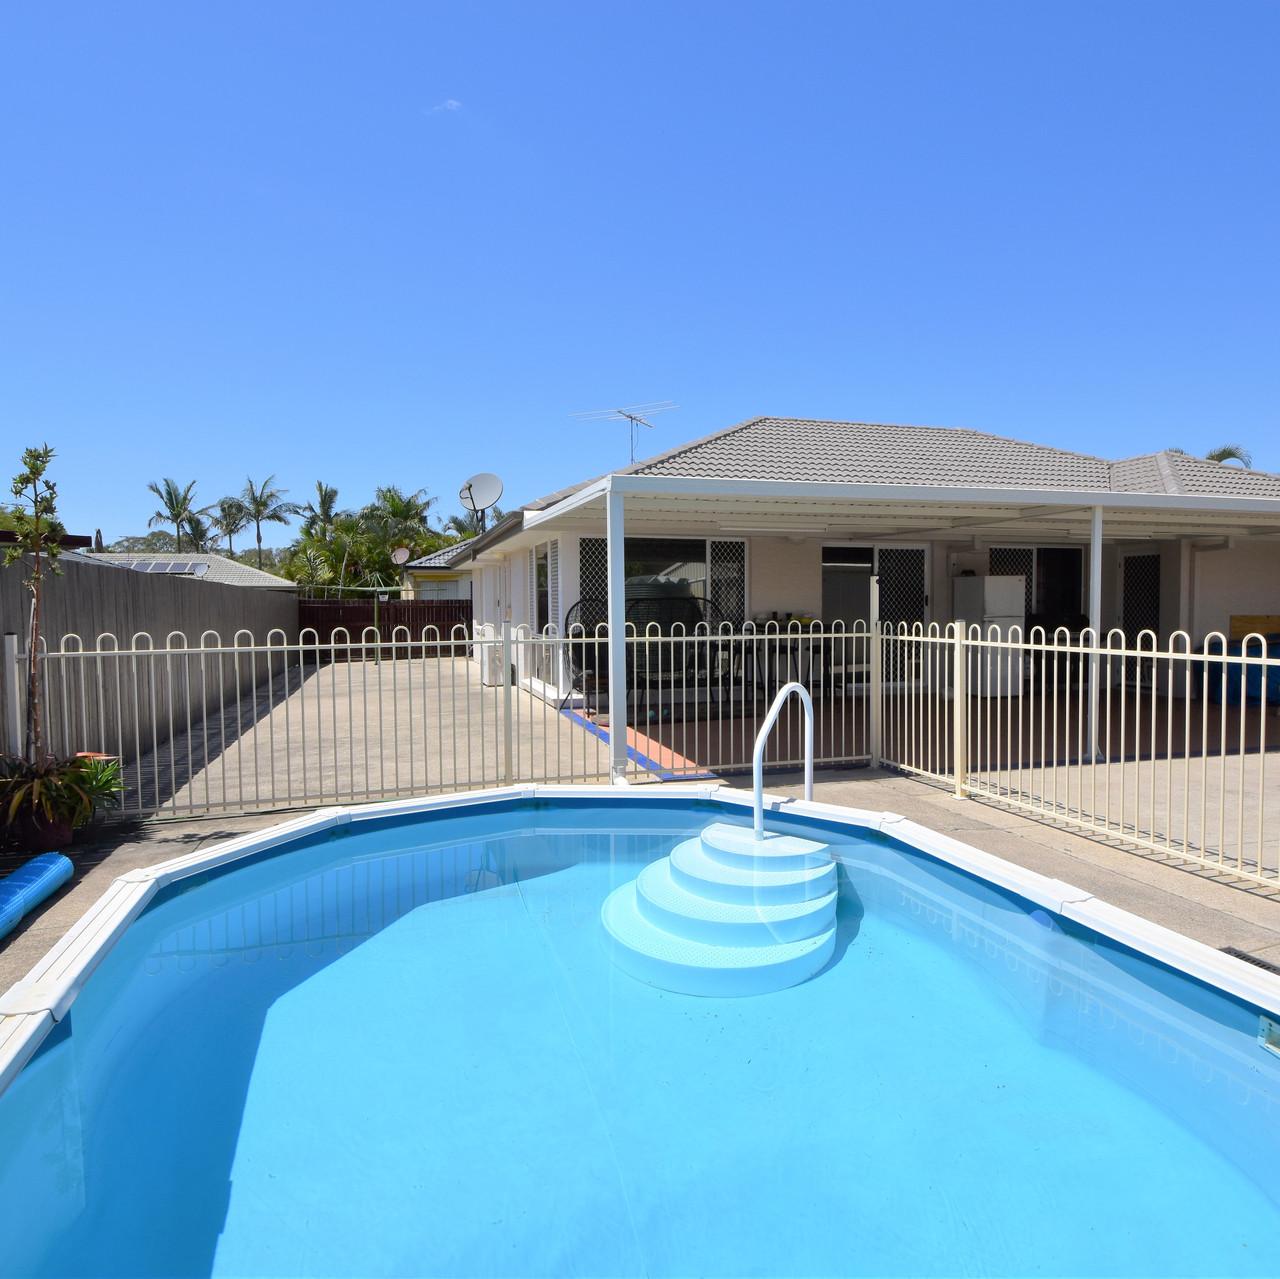 Pool-back yard area1 - Ed